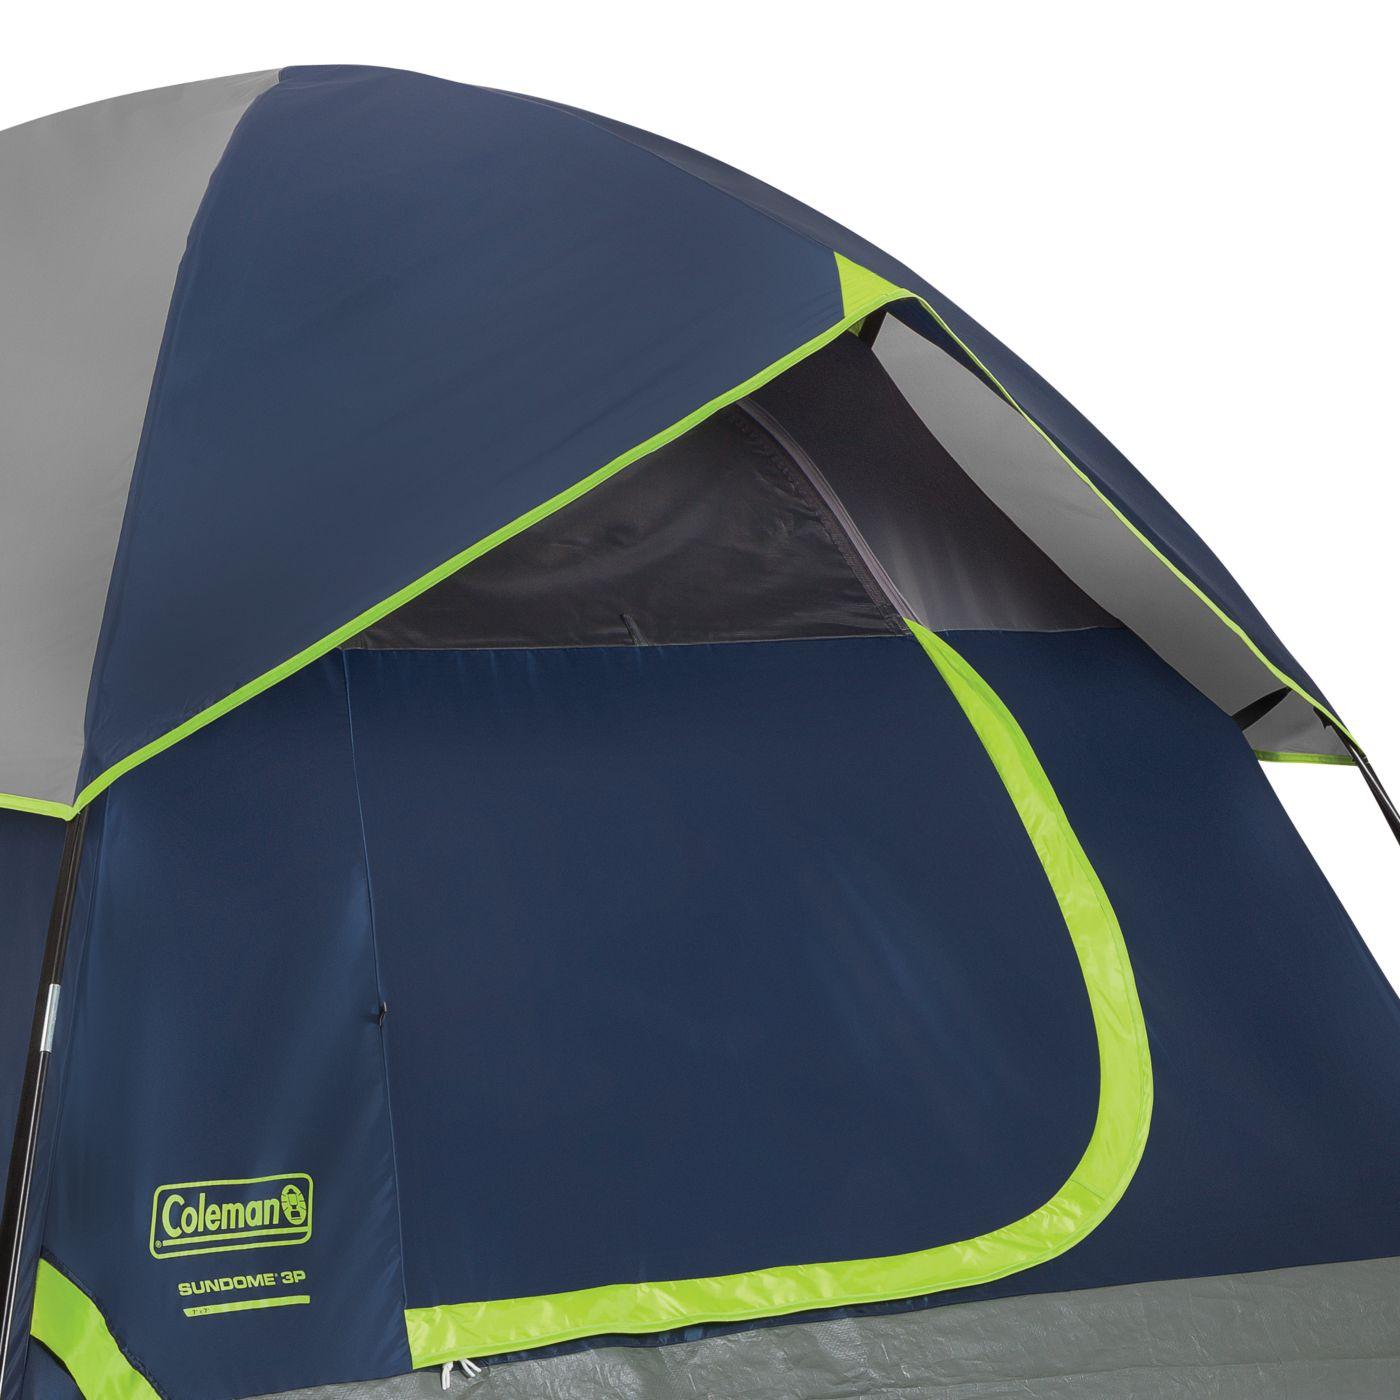 ... Sundome® 3-Person Dome Tent image 6 ...  sc 1 st  Coleman & Sundome® 3-Person Dome Tent | Coleman